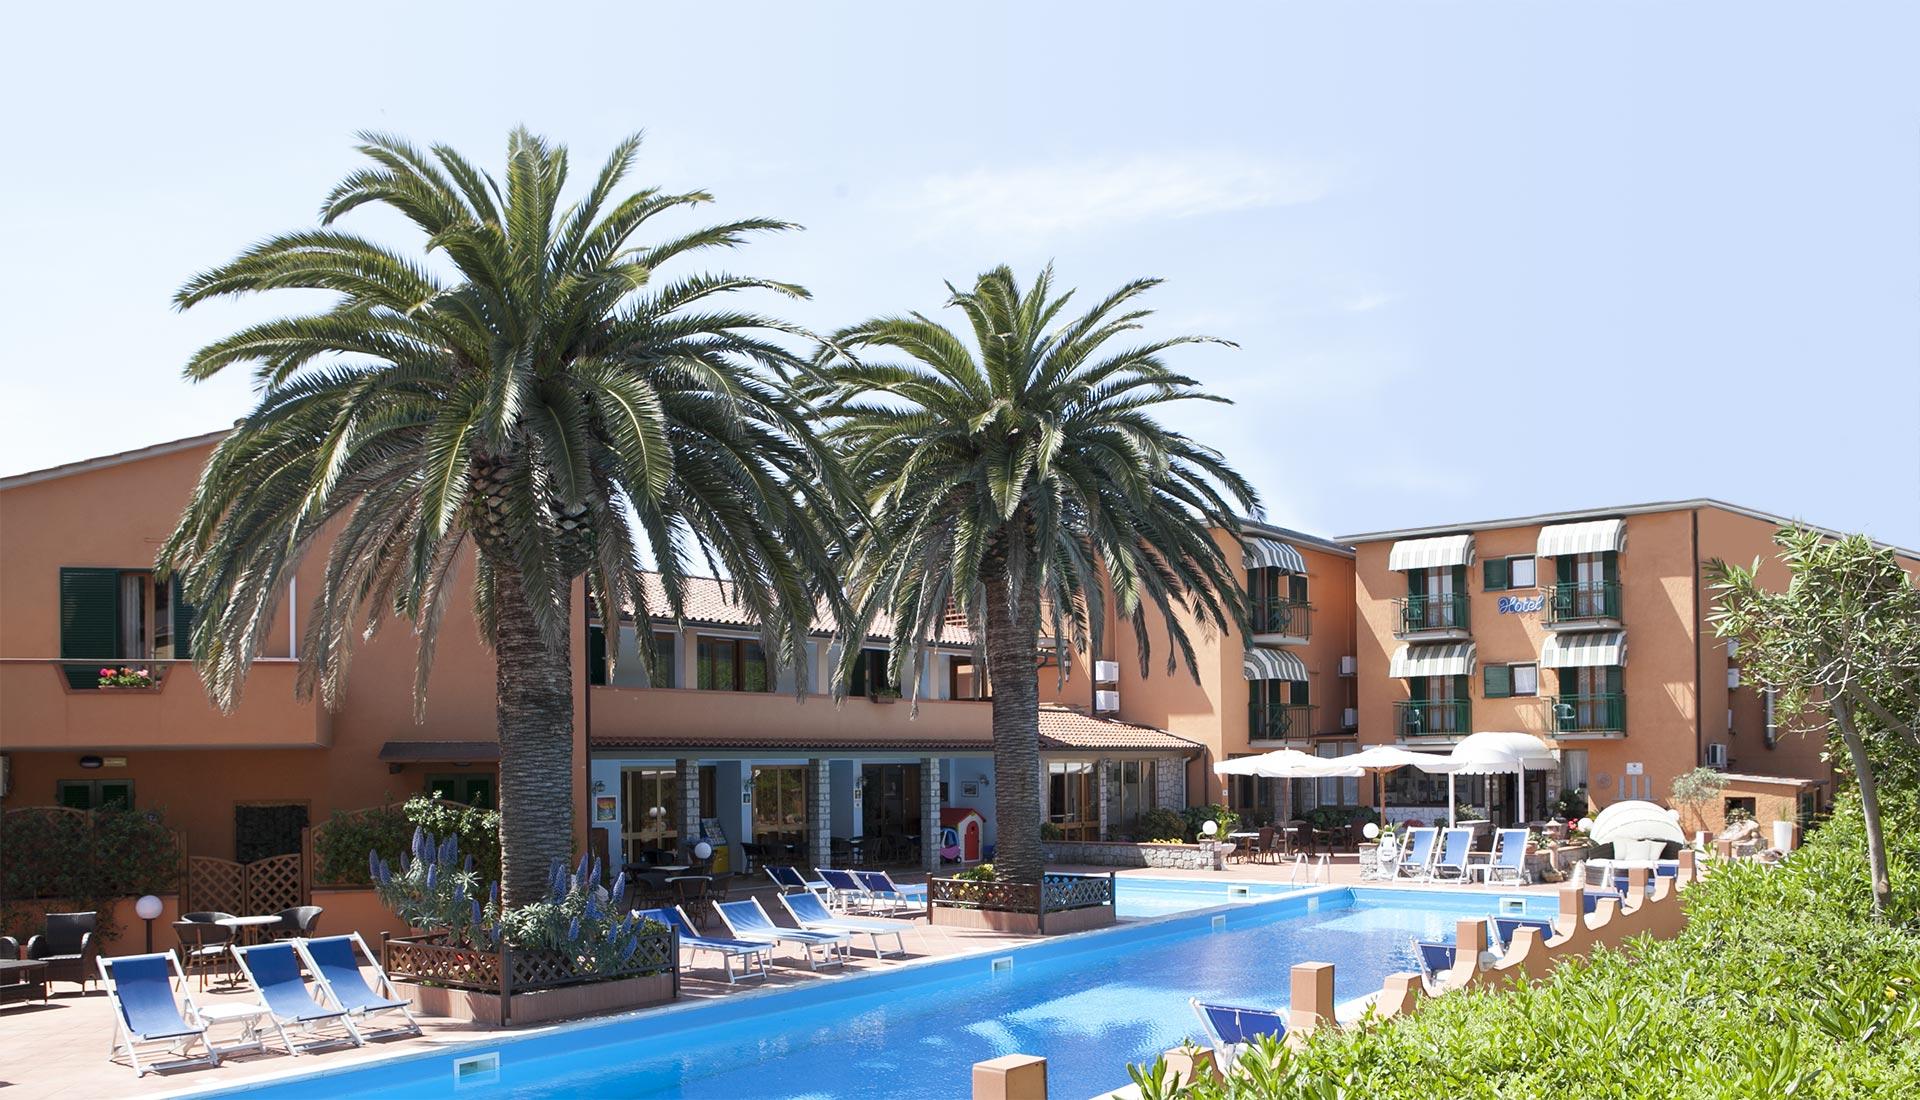 Hotel Tre Colonne Isola d'Elba